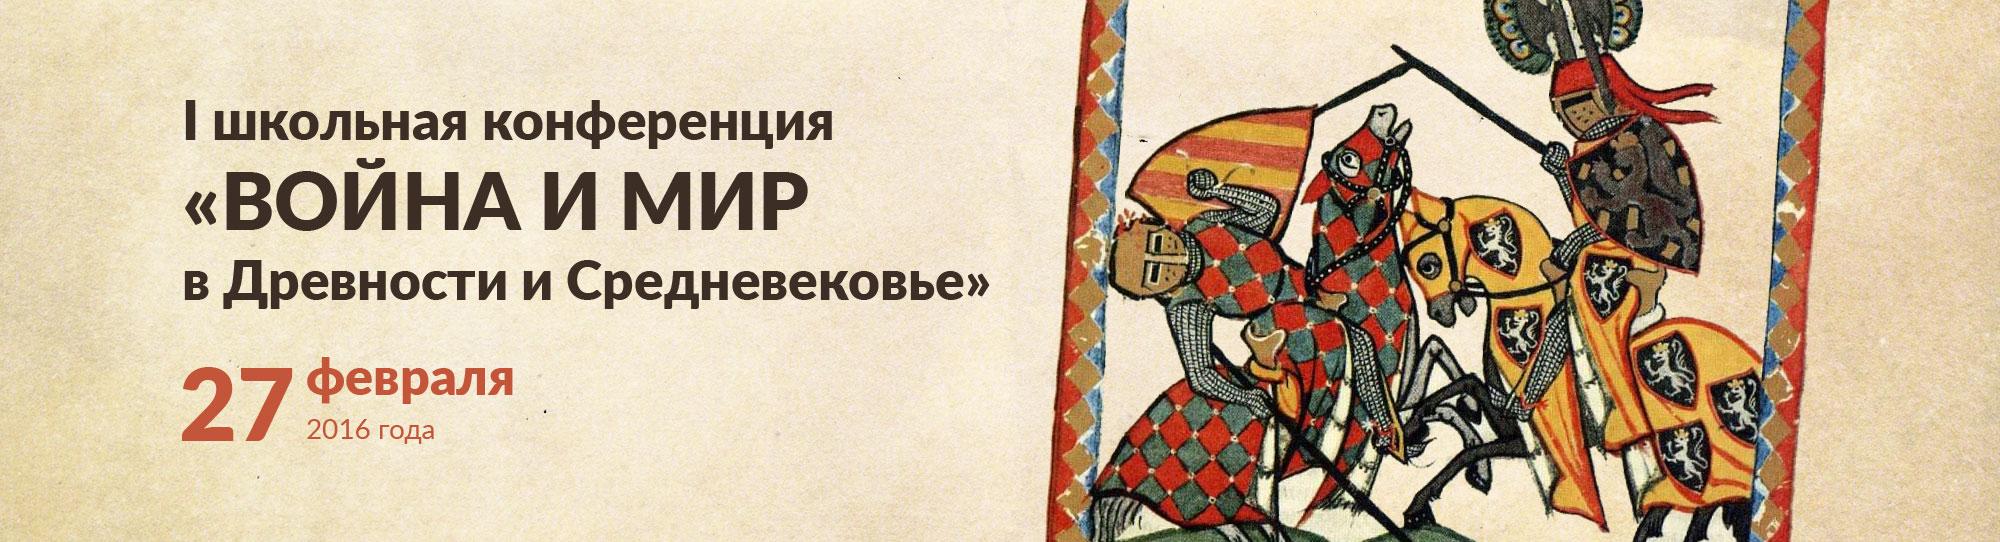 mpgu-site-big-banner-Konferenciya-srednevekovie